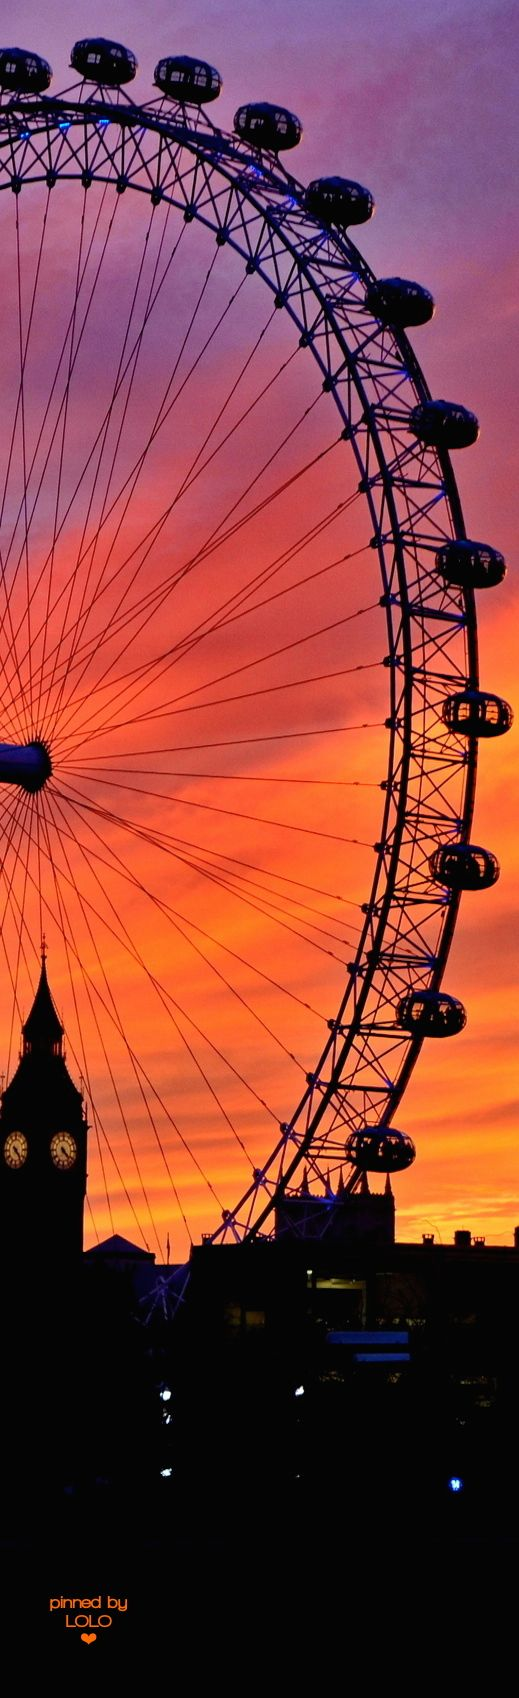 London by Vladimir Brovko via Flickr | LOLO❤